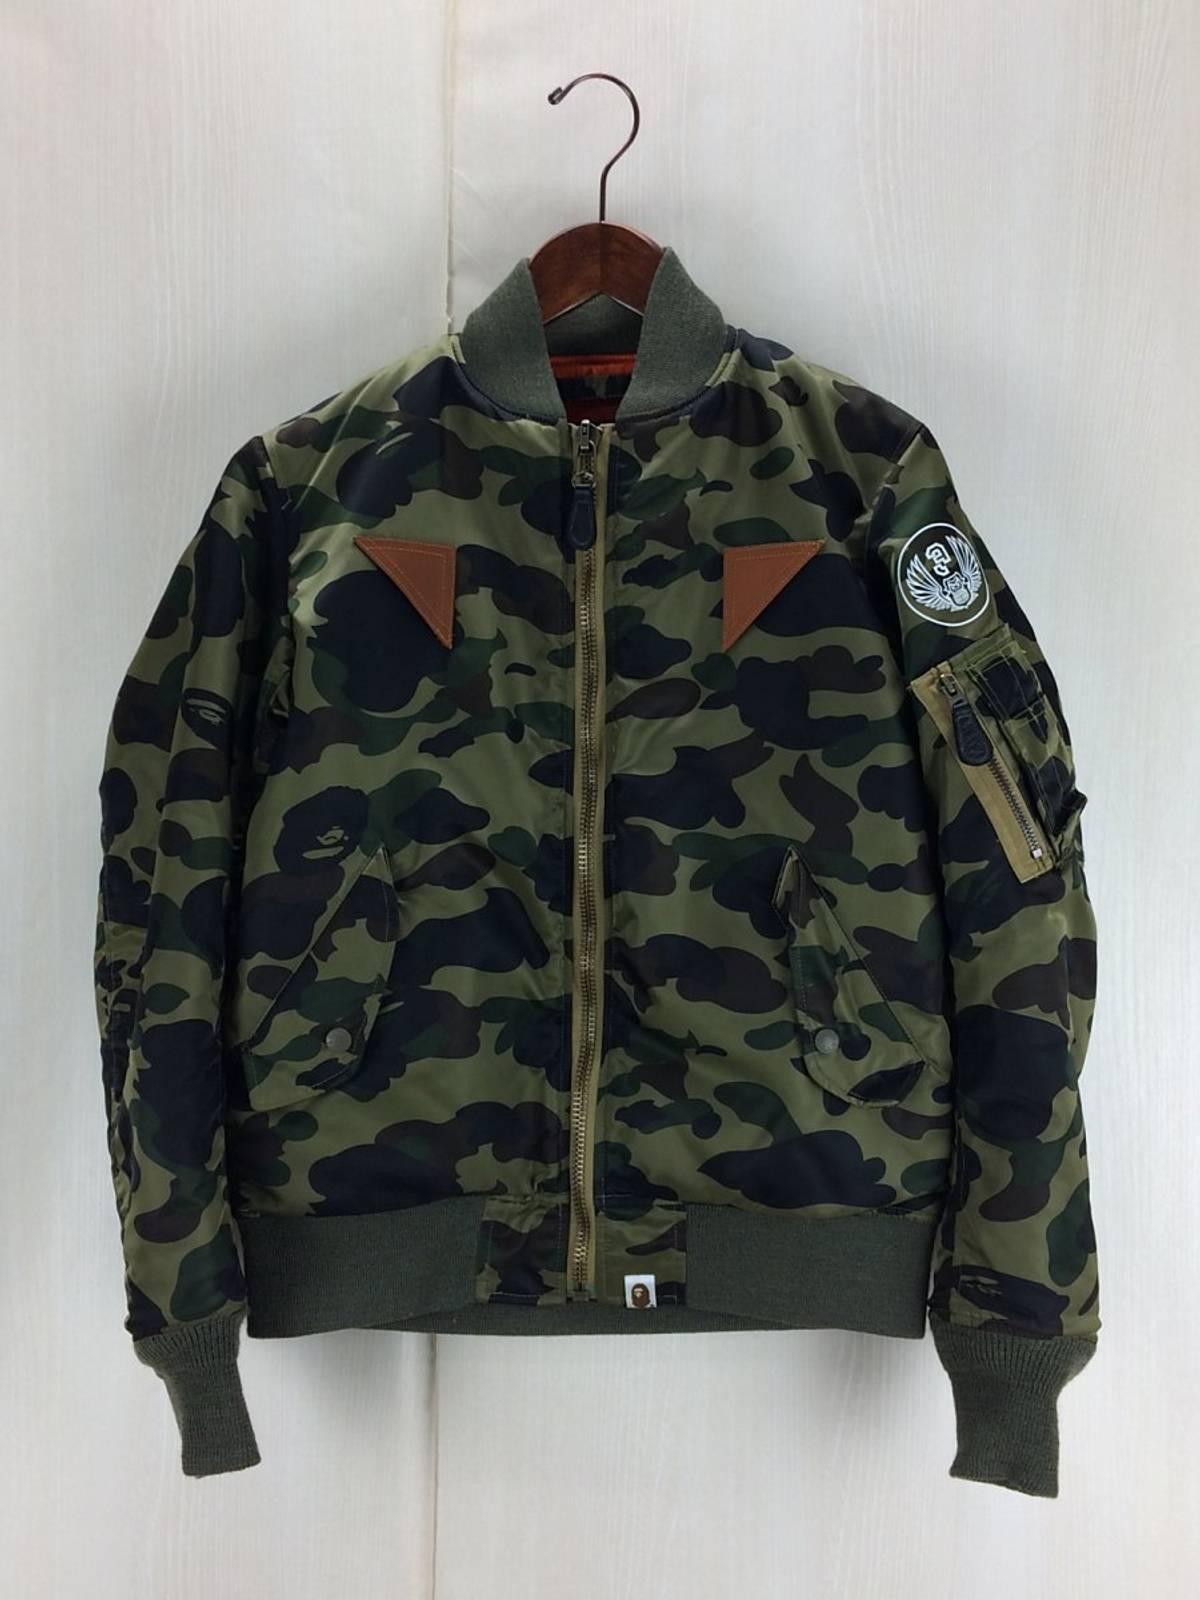 a6ebe8569 Bape Jacket Khaki Nylon Ma 1 Flight Camouflage Pattern Zip Up Size S $392